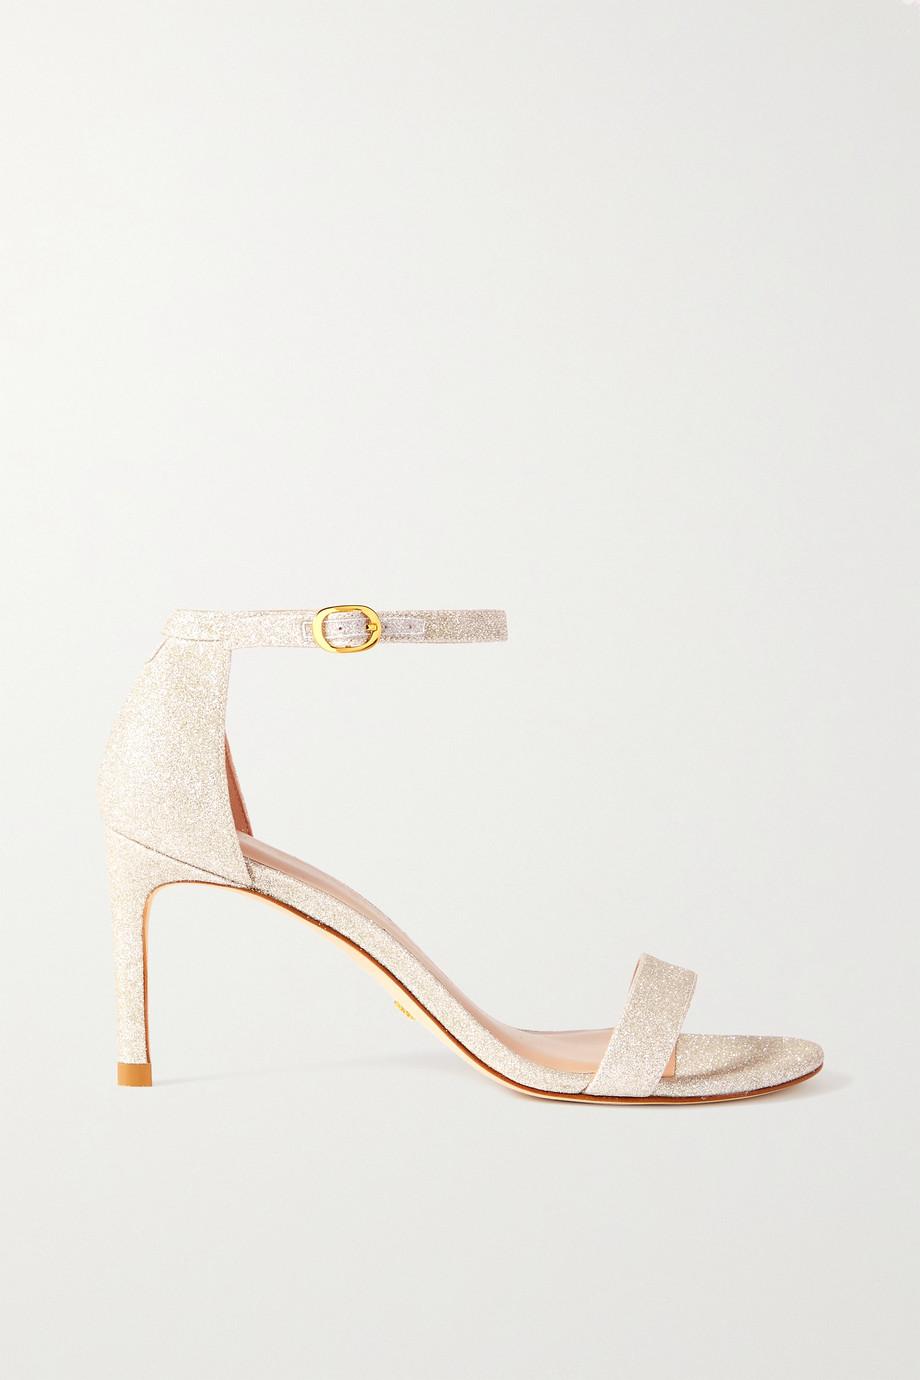 Stuart Weitzman Nunaked Sandalen aus Leder mit Glitter-Finish